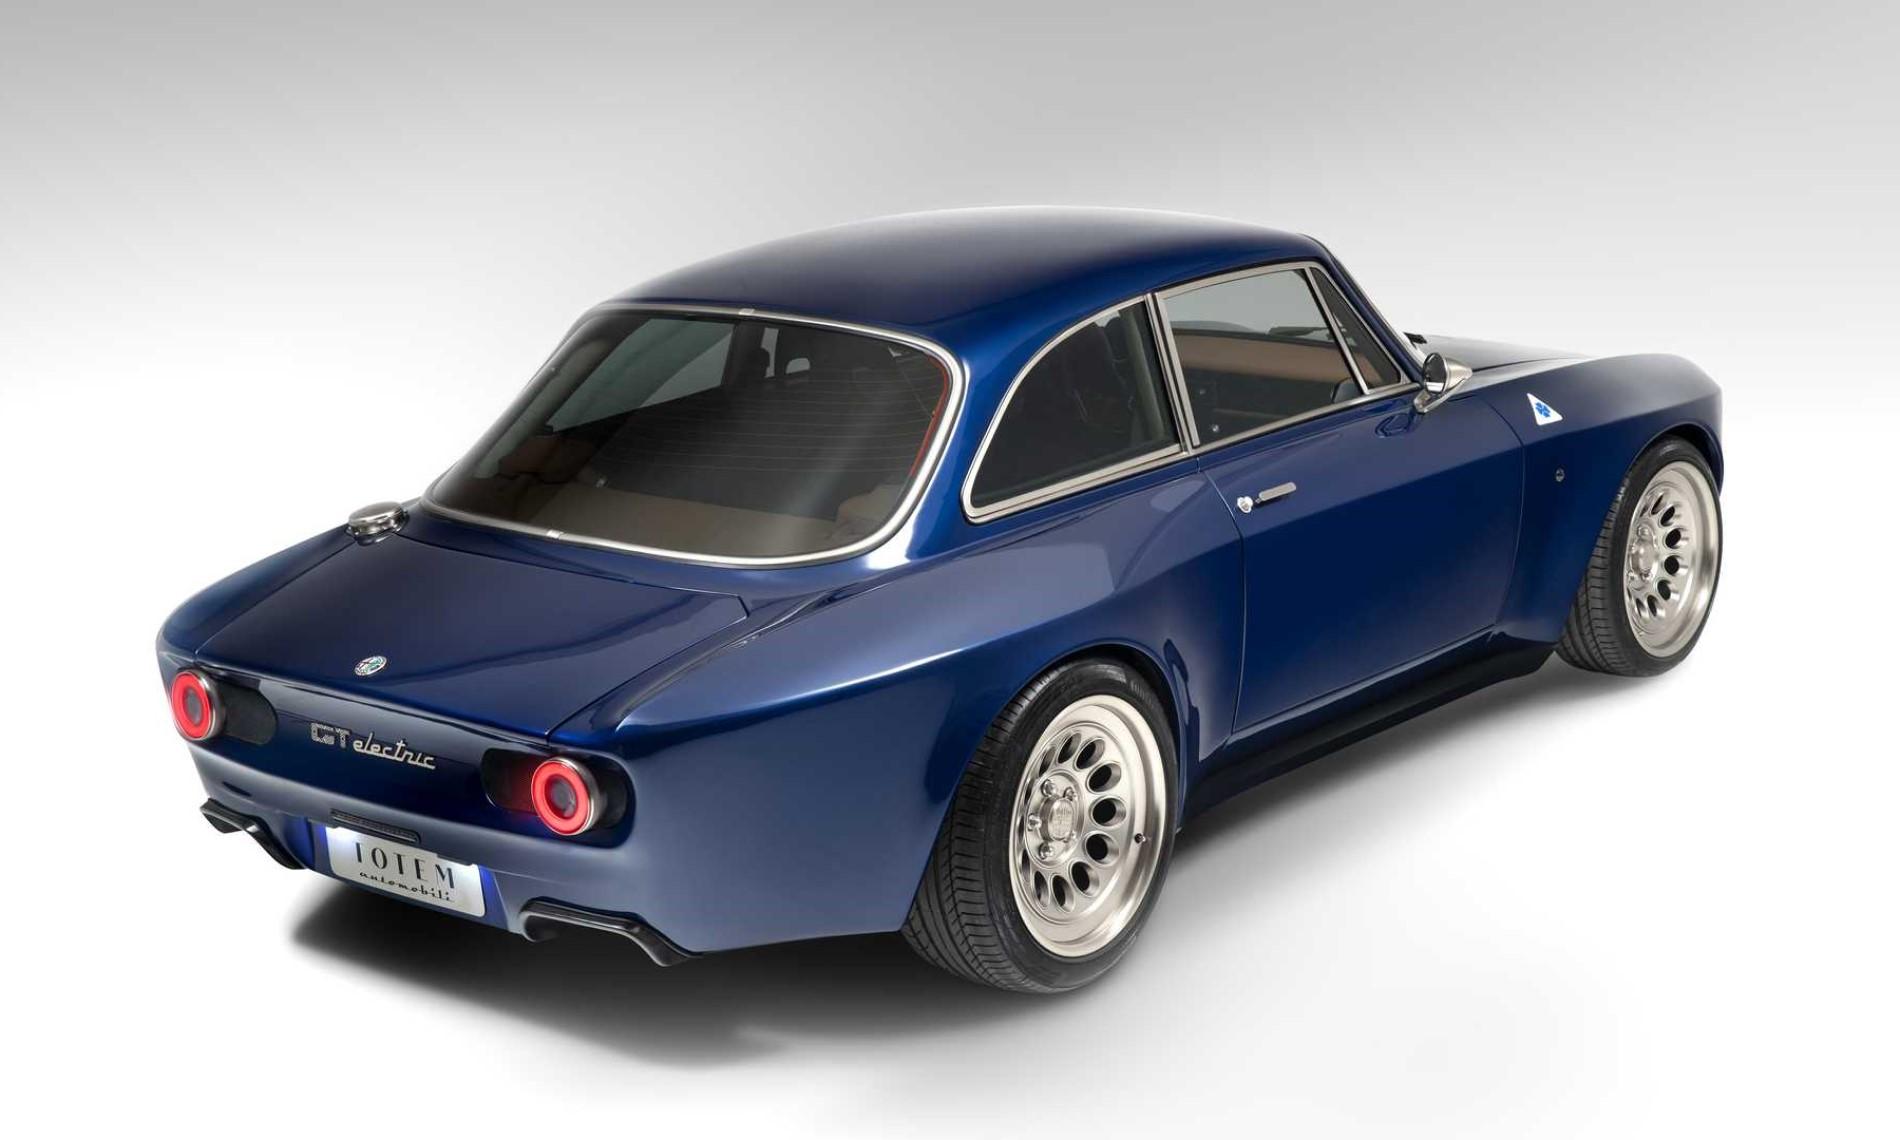 Totem Automobili Electric Alfa Romeo GT rear